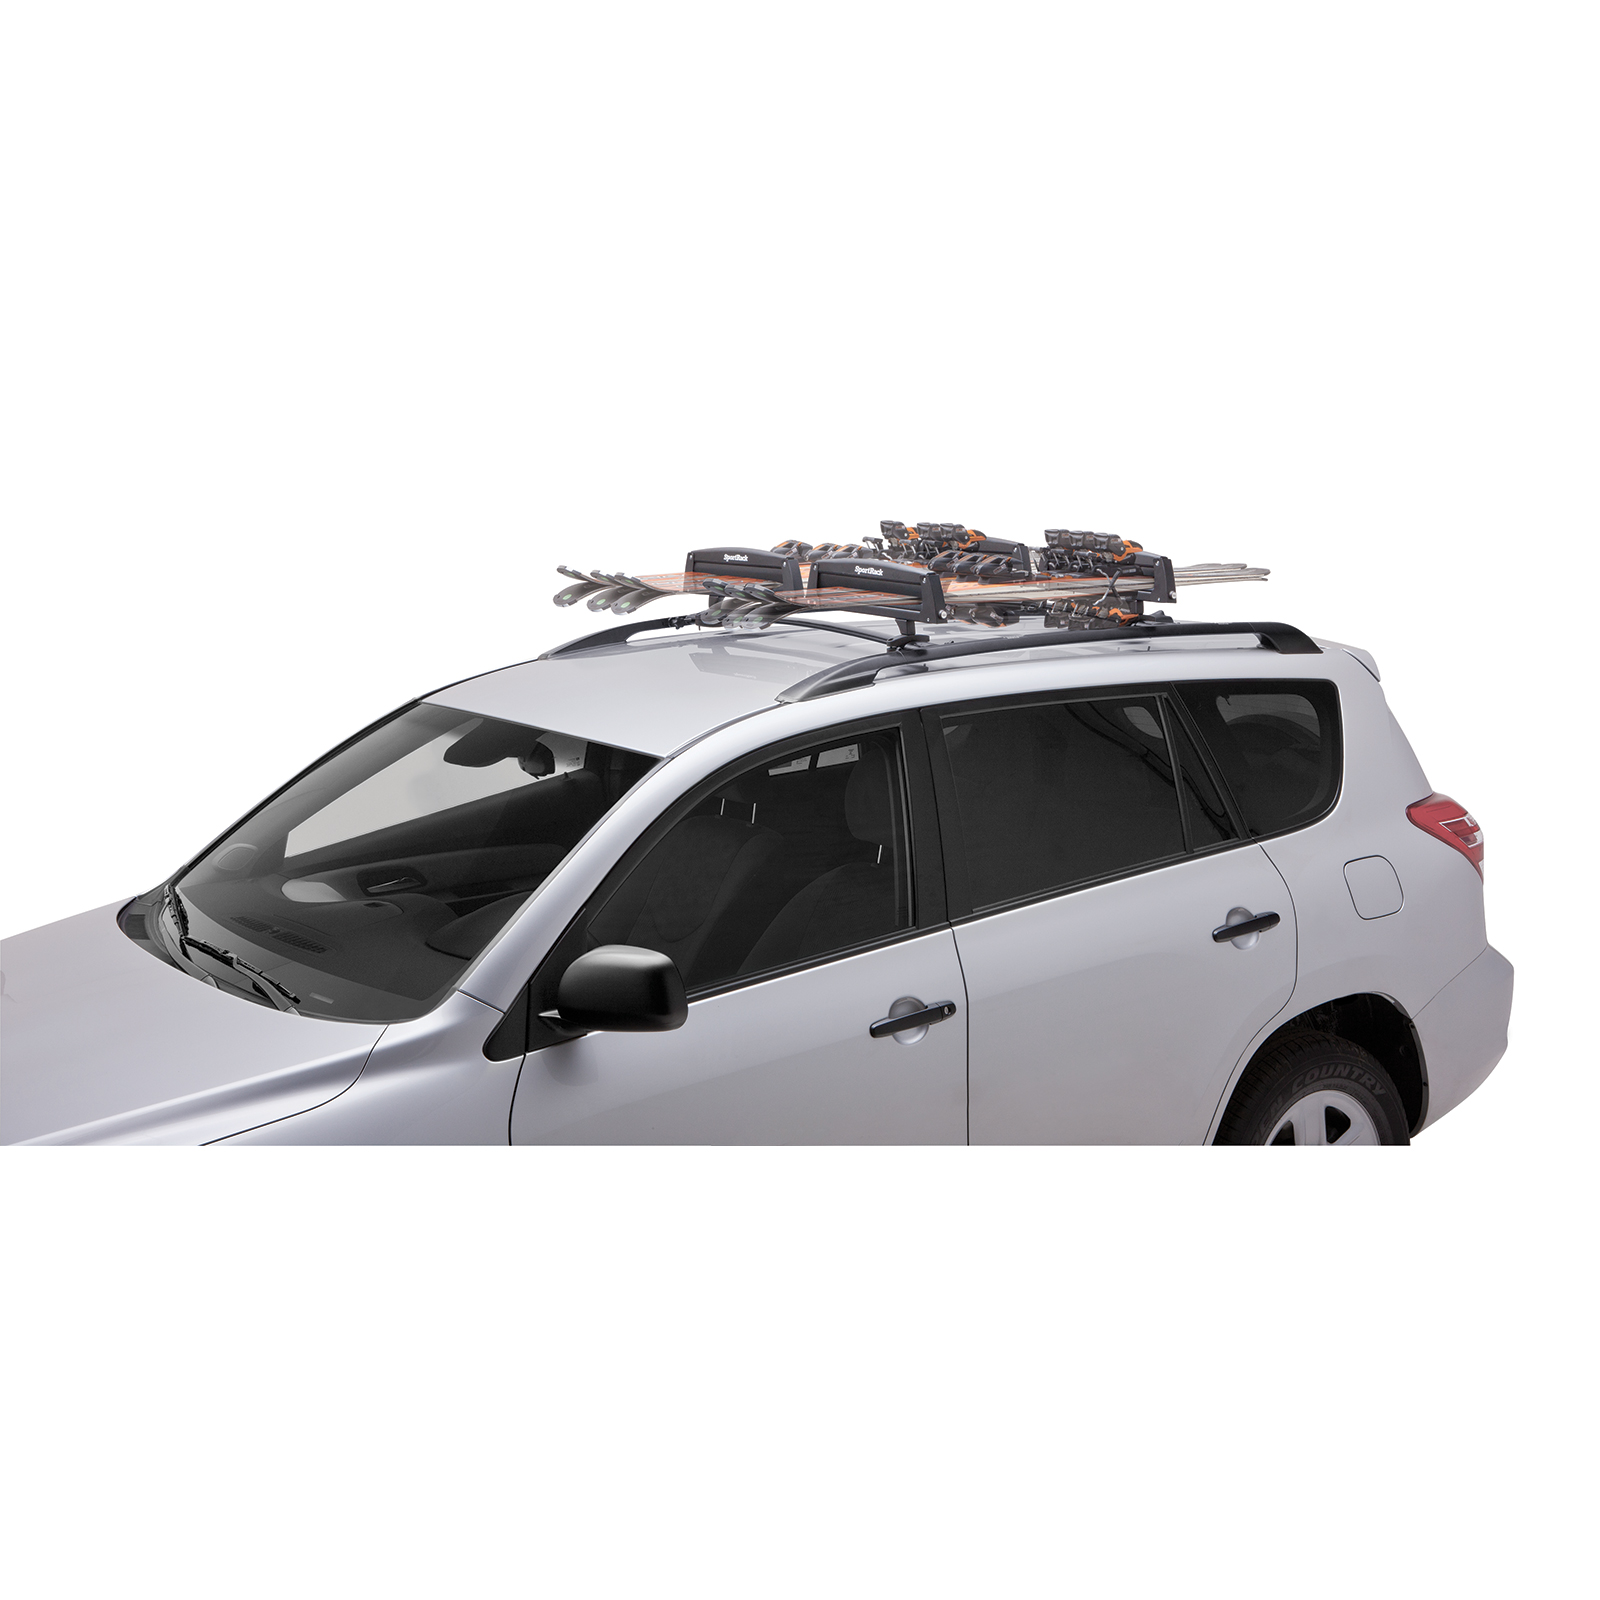 Sportrack Locking Roof Ski Snowboard Carrier